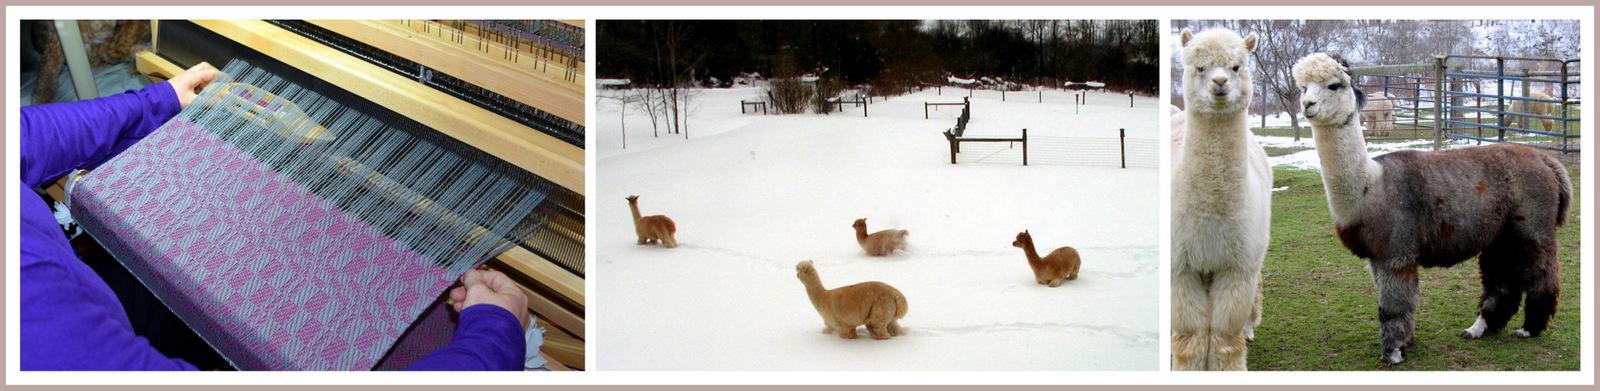 Annadele Alpacas, Open House, Open Farm